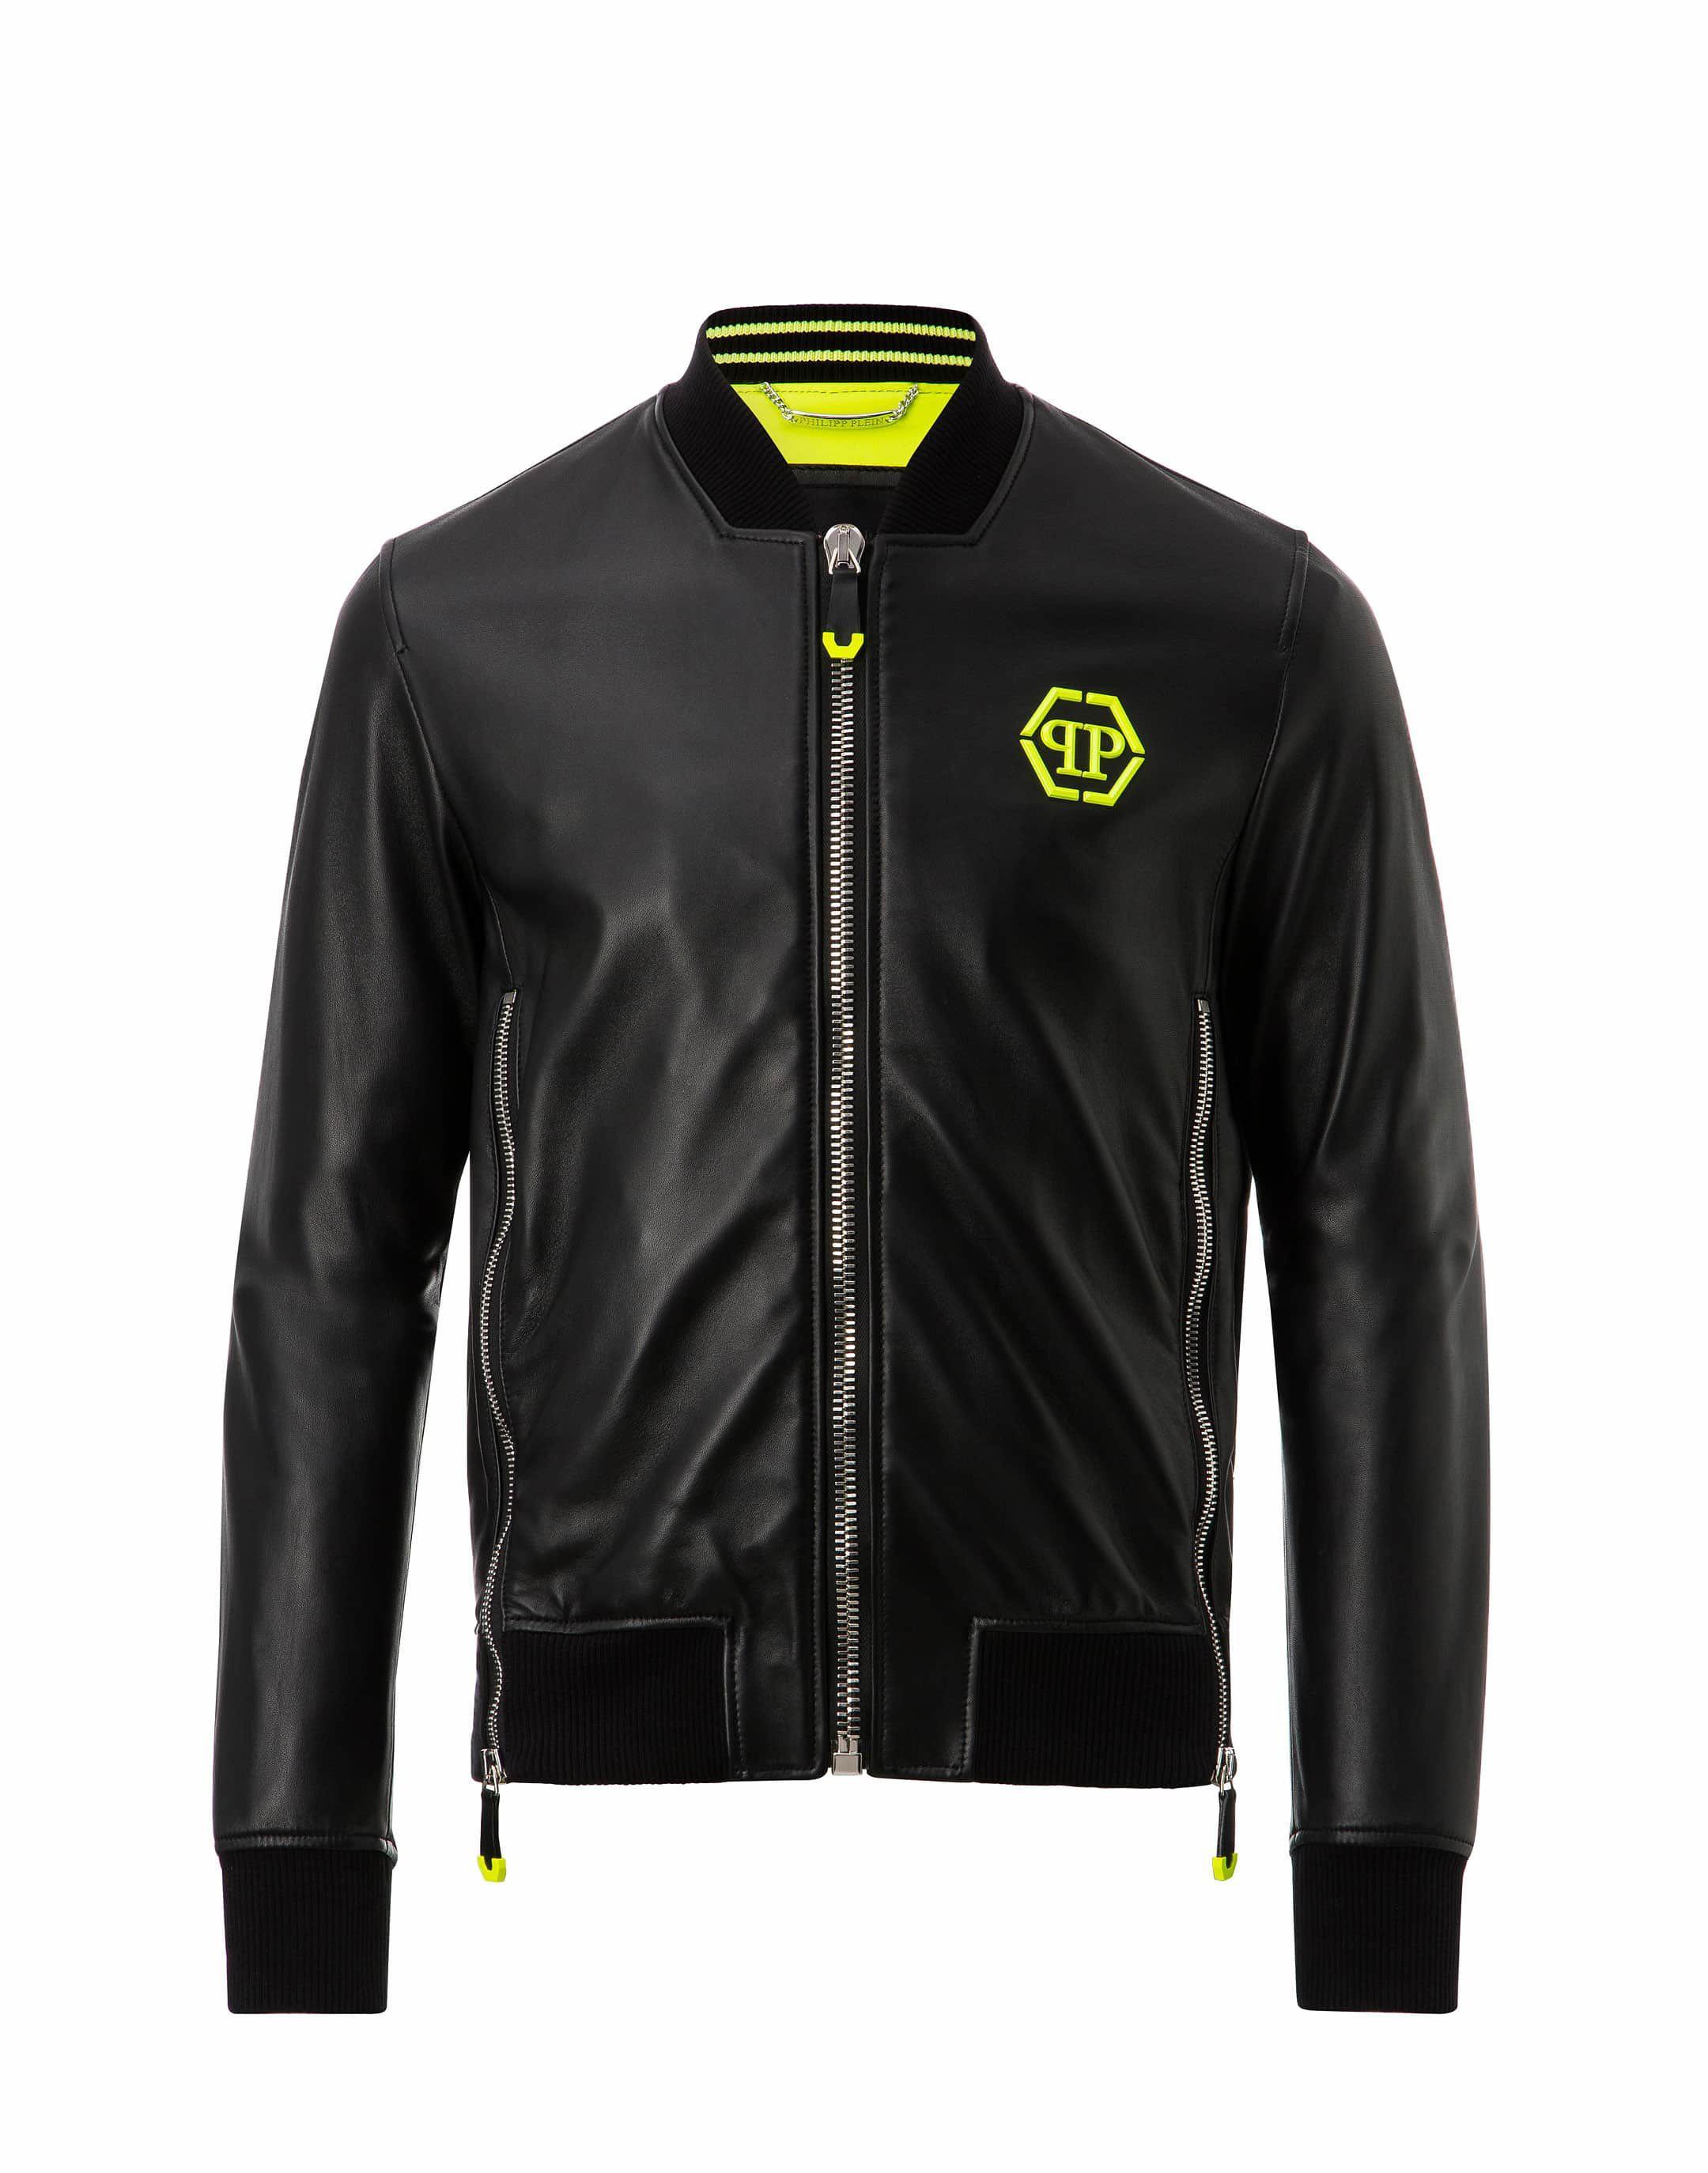 Philipp Plein Aggressive bomber jacket - Black Top Quality Cheap Online Clearance Huge Surprise Sale Online Cheap Online Manchester Great Sale Sale Online U9YYO